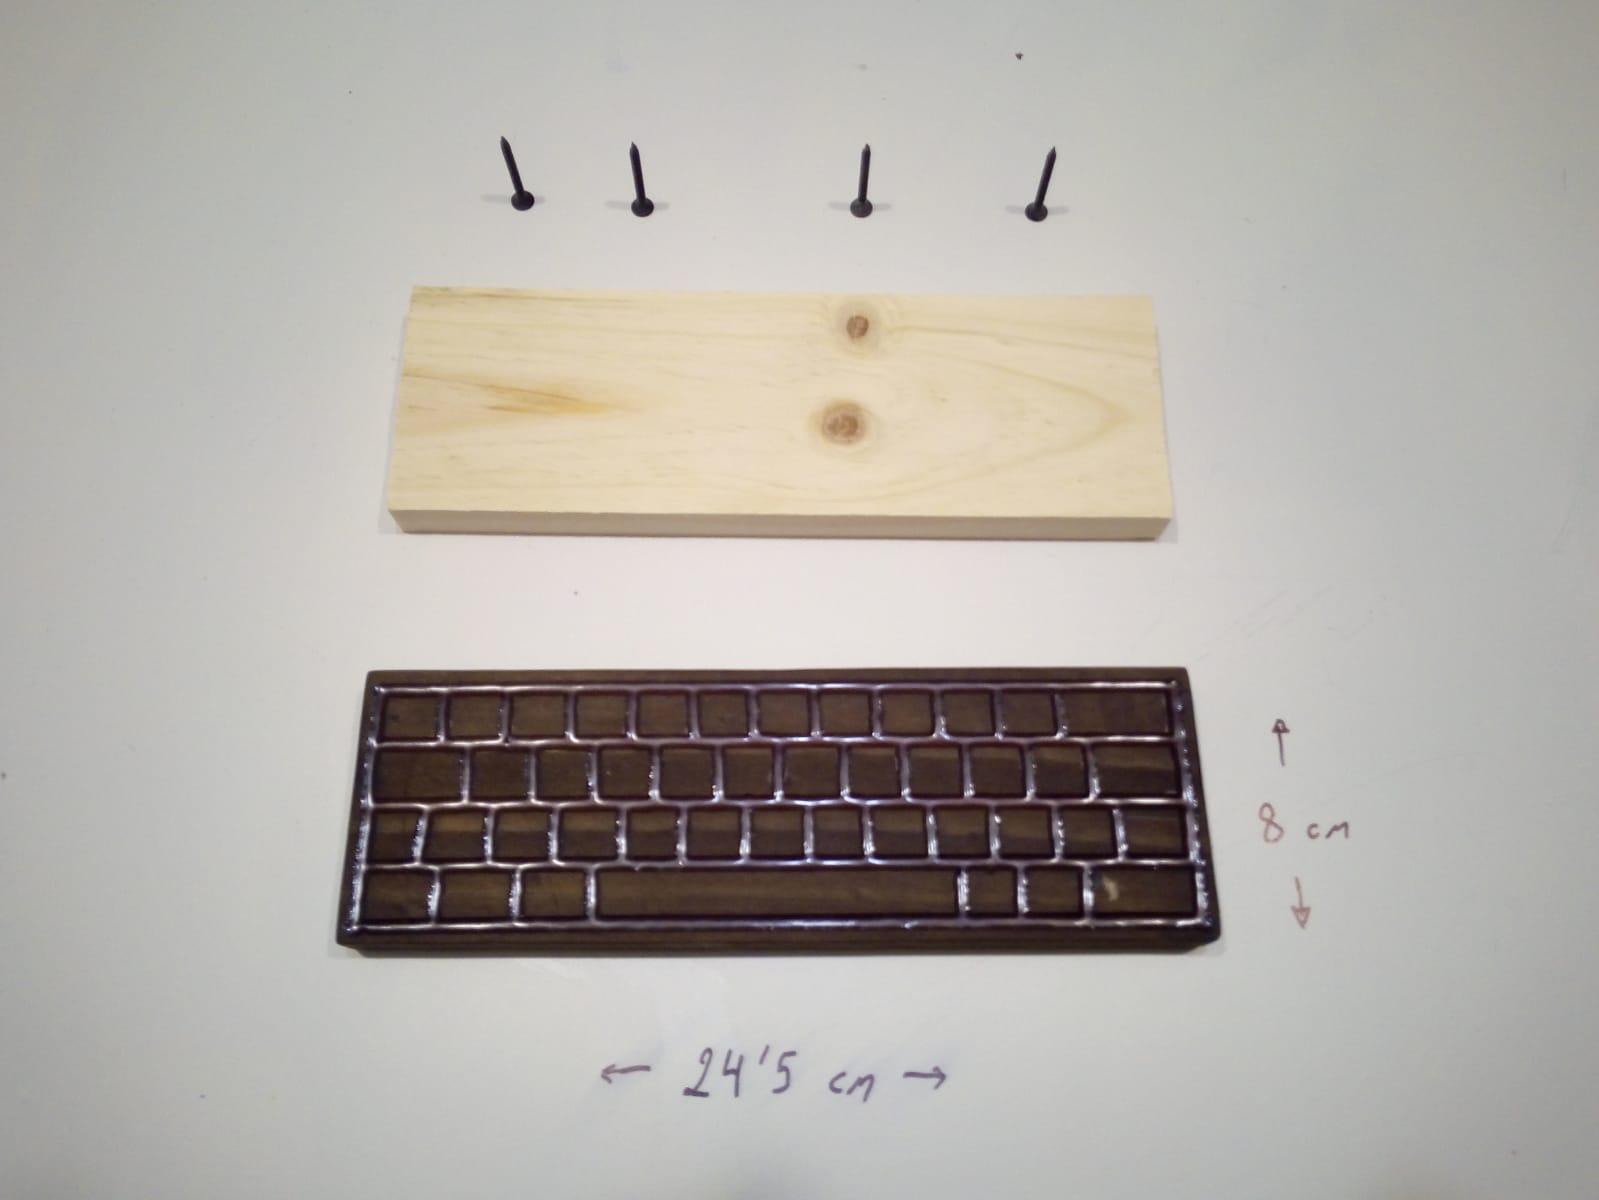 [Image: teclado.jpeg]